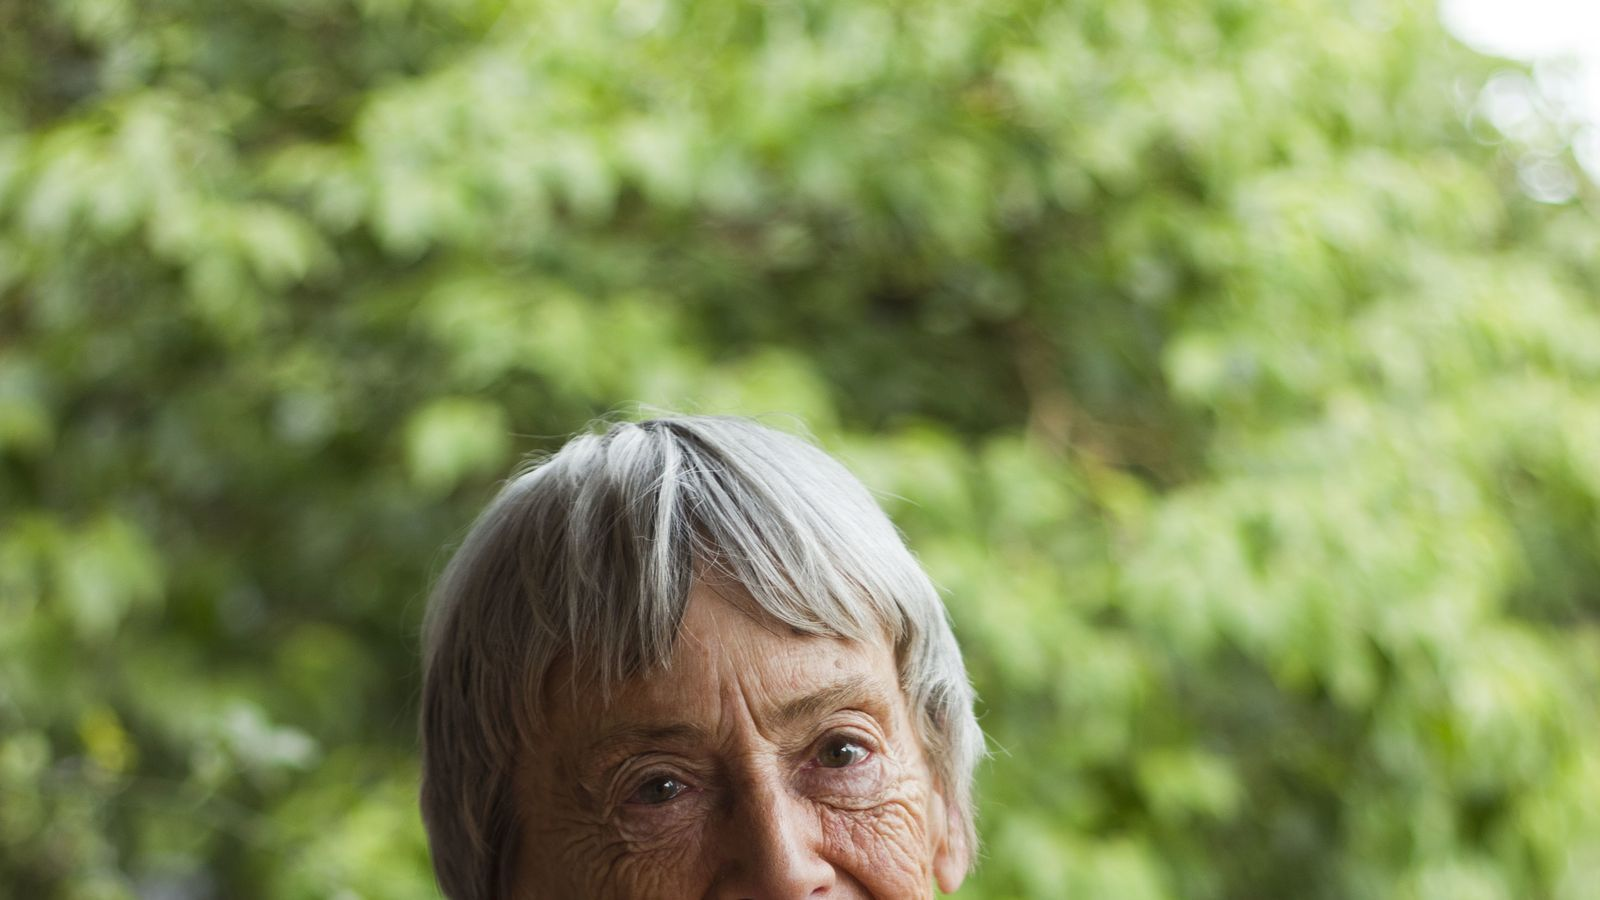 Ursula K Le Guin referent de la cincia ficci